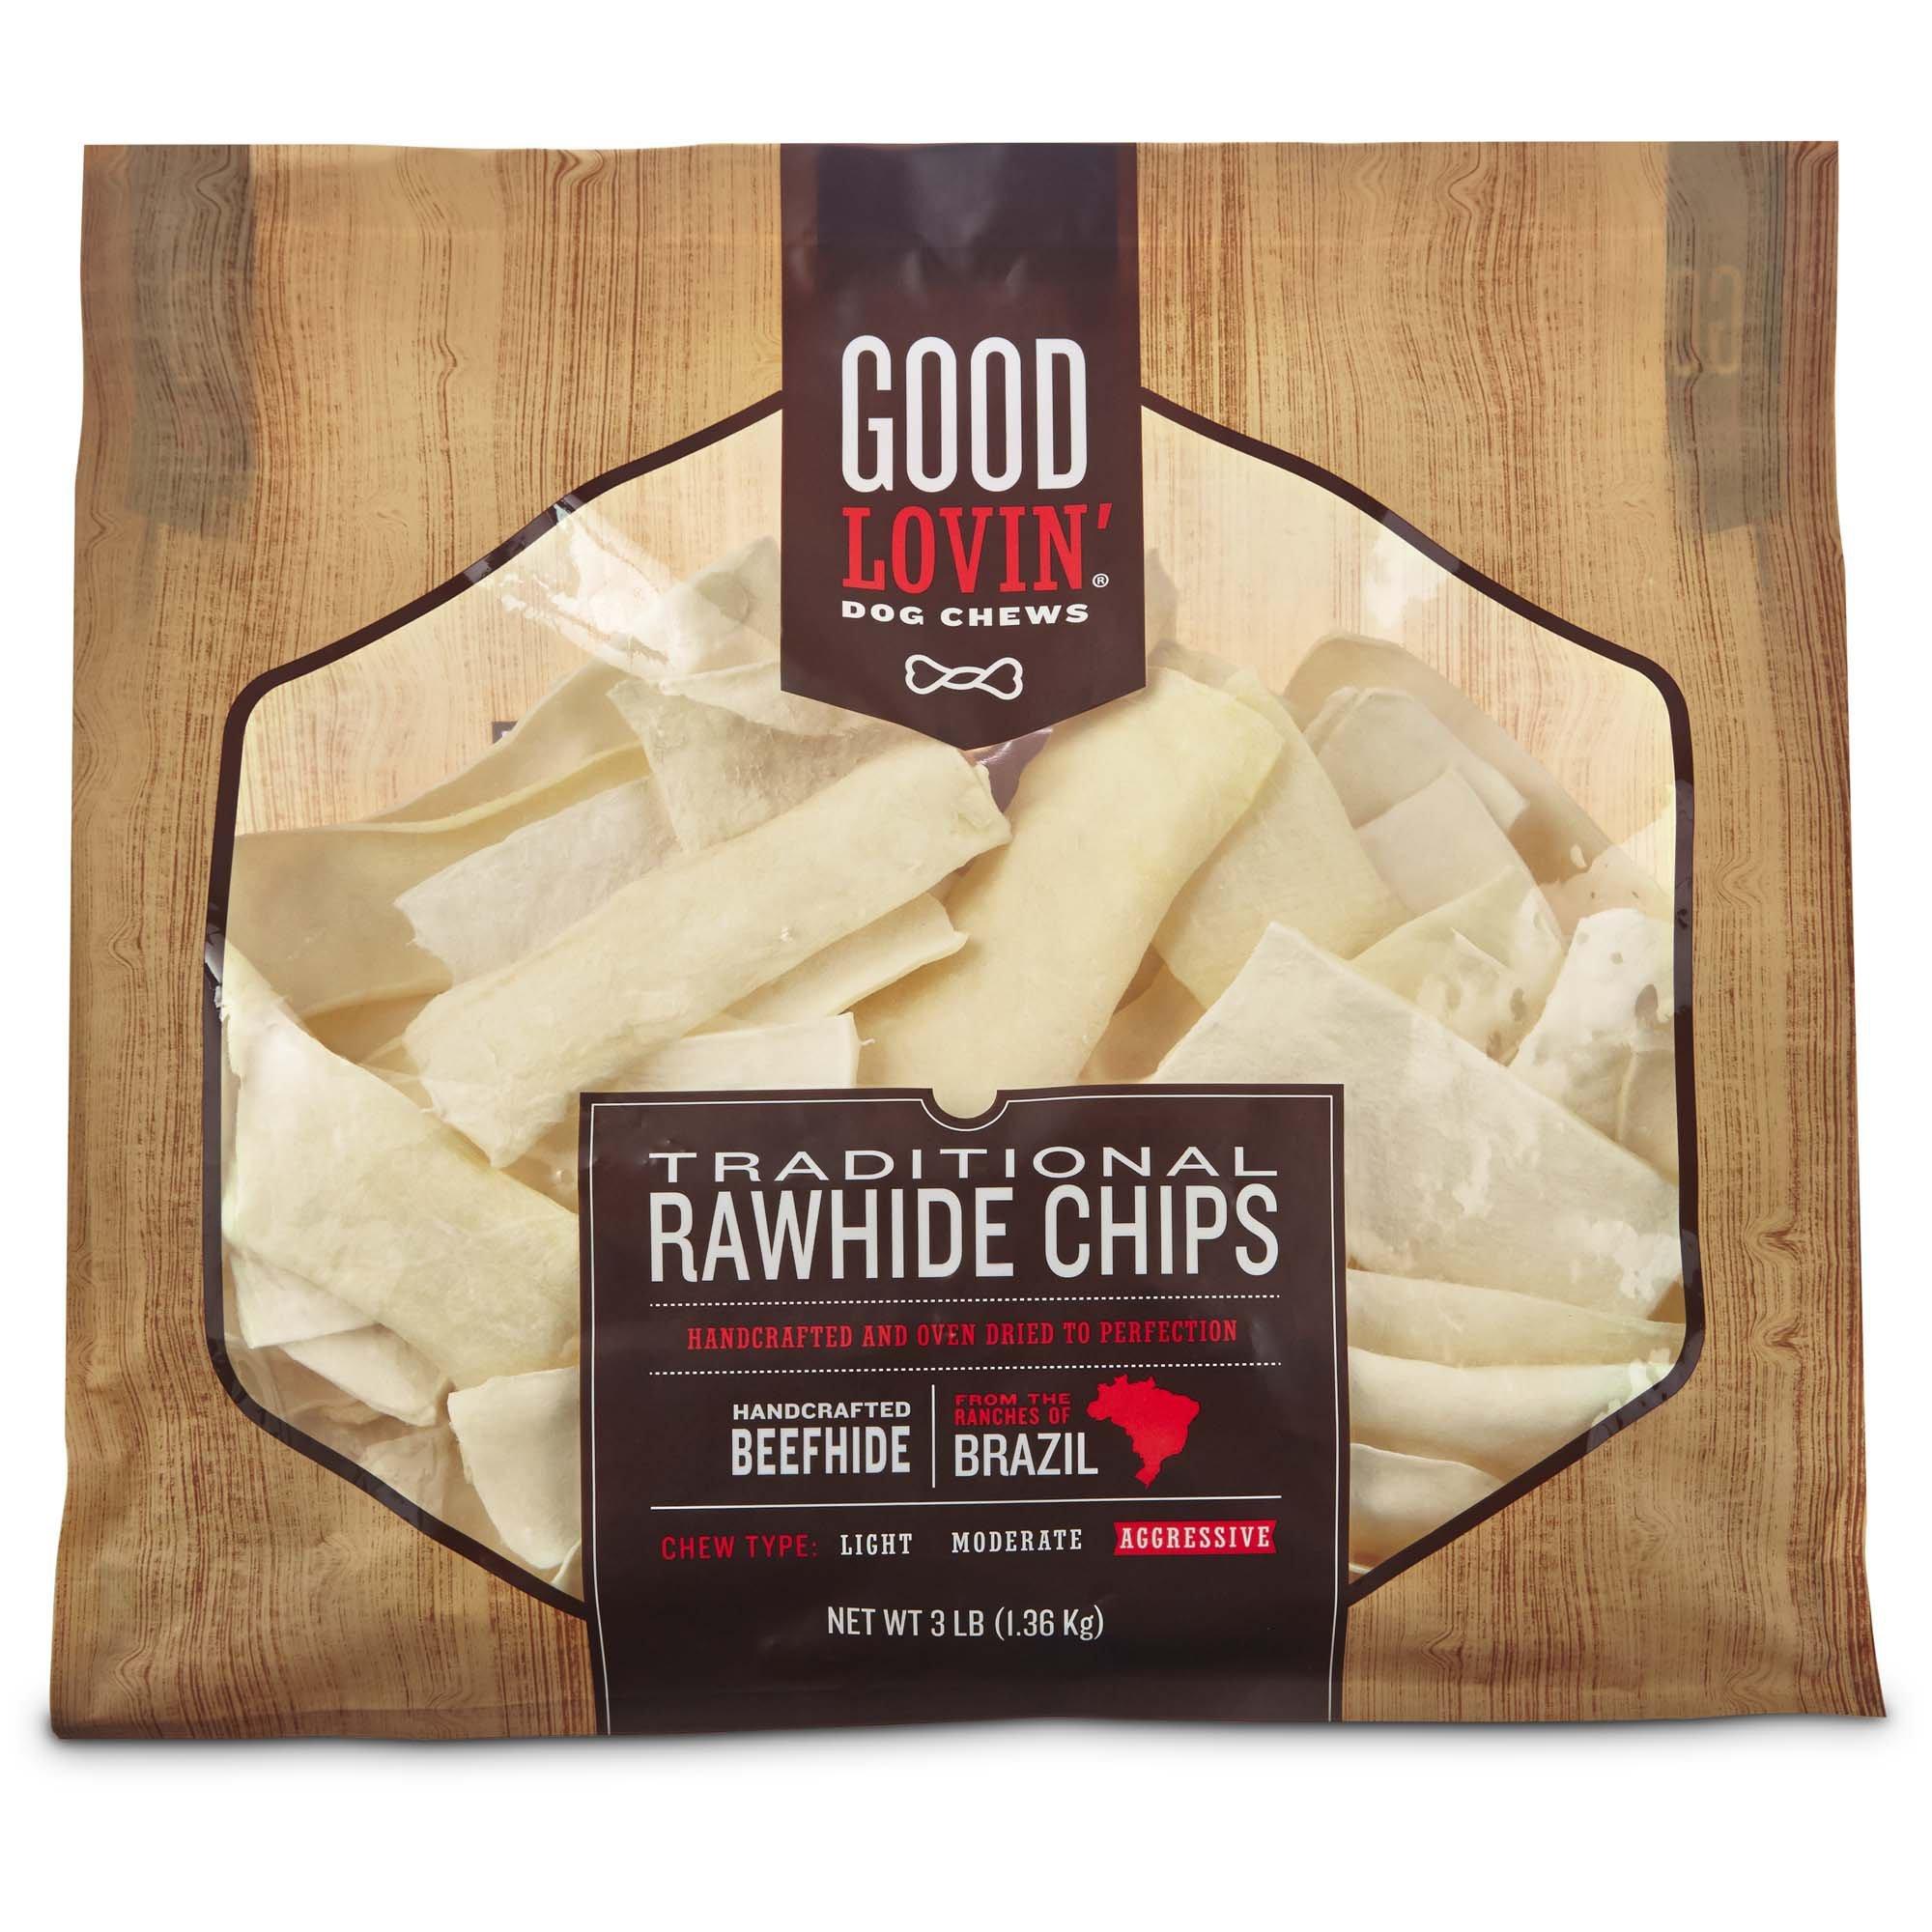 Good Lovin' Traditional Rawhide Chip Dog Chews, 3 lbs.